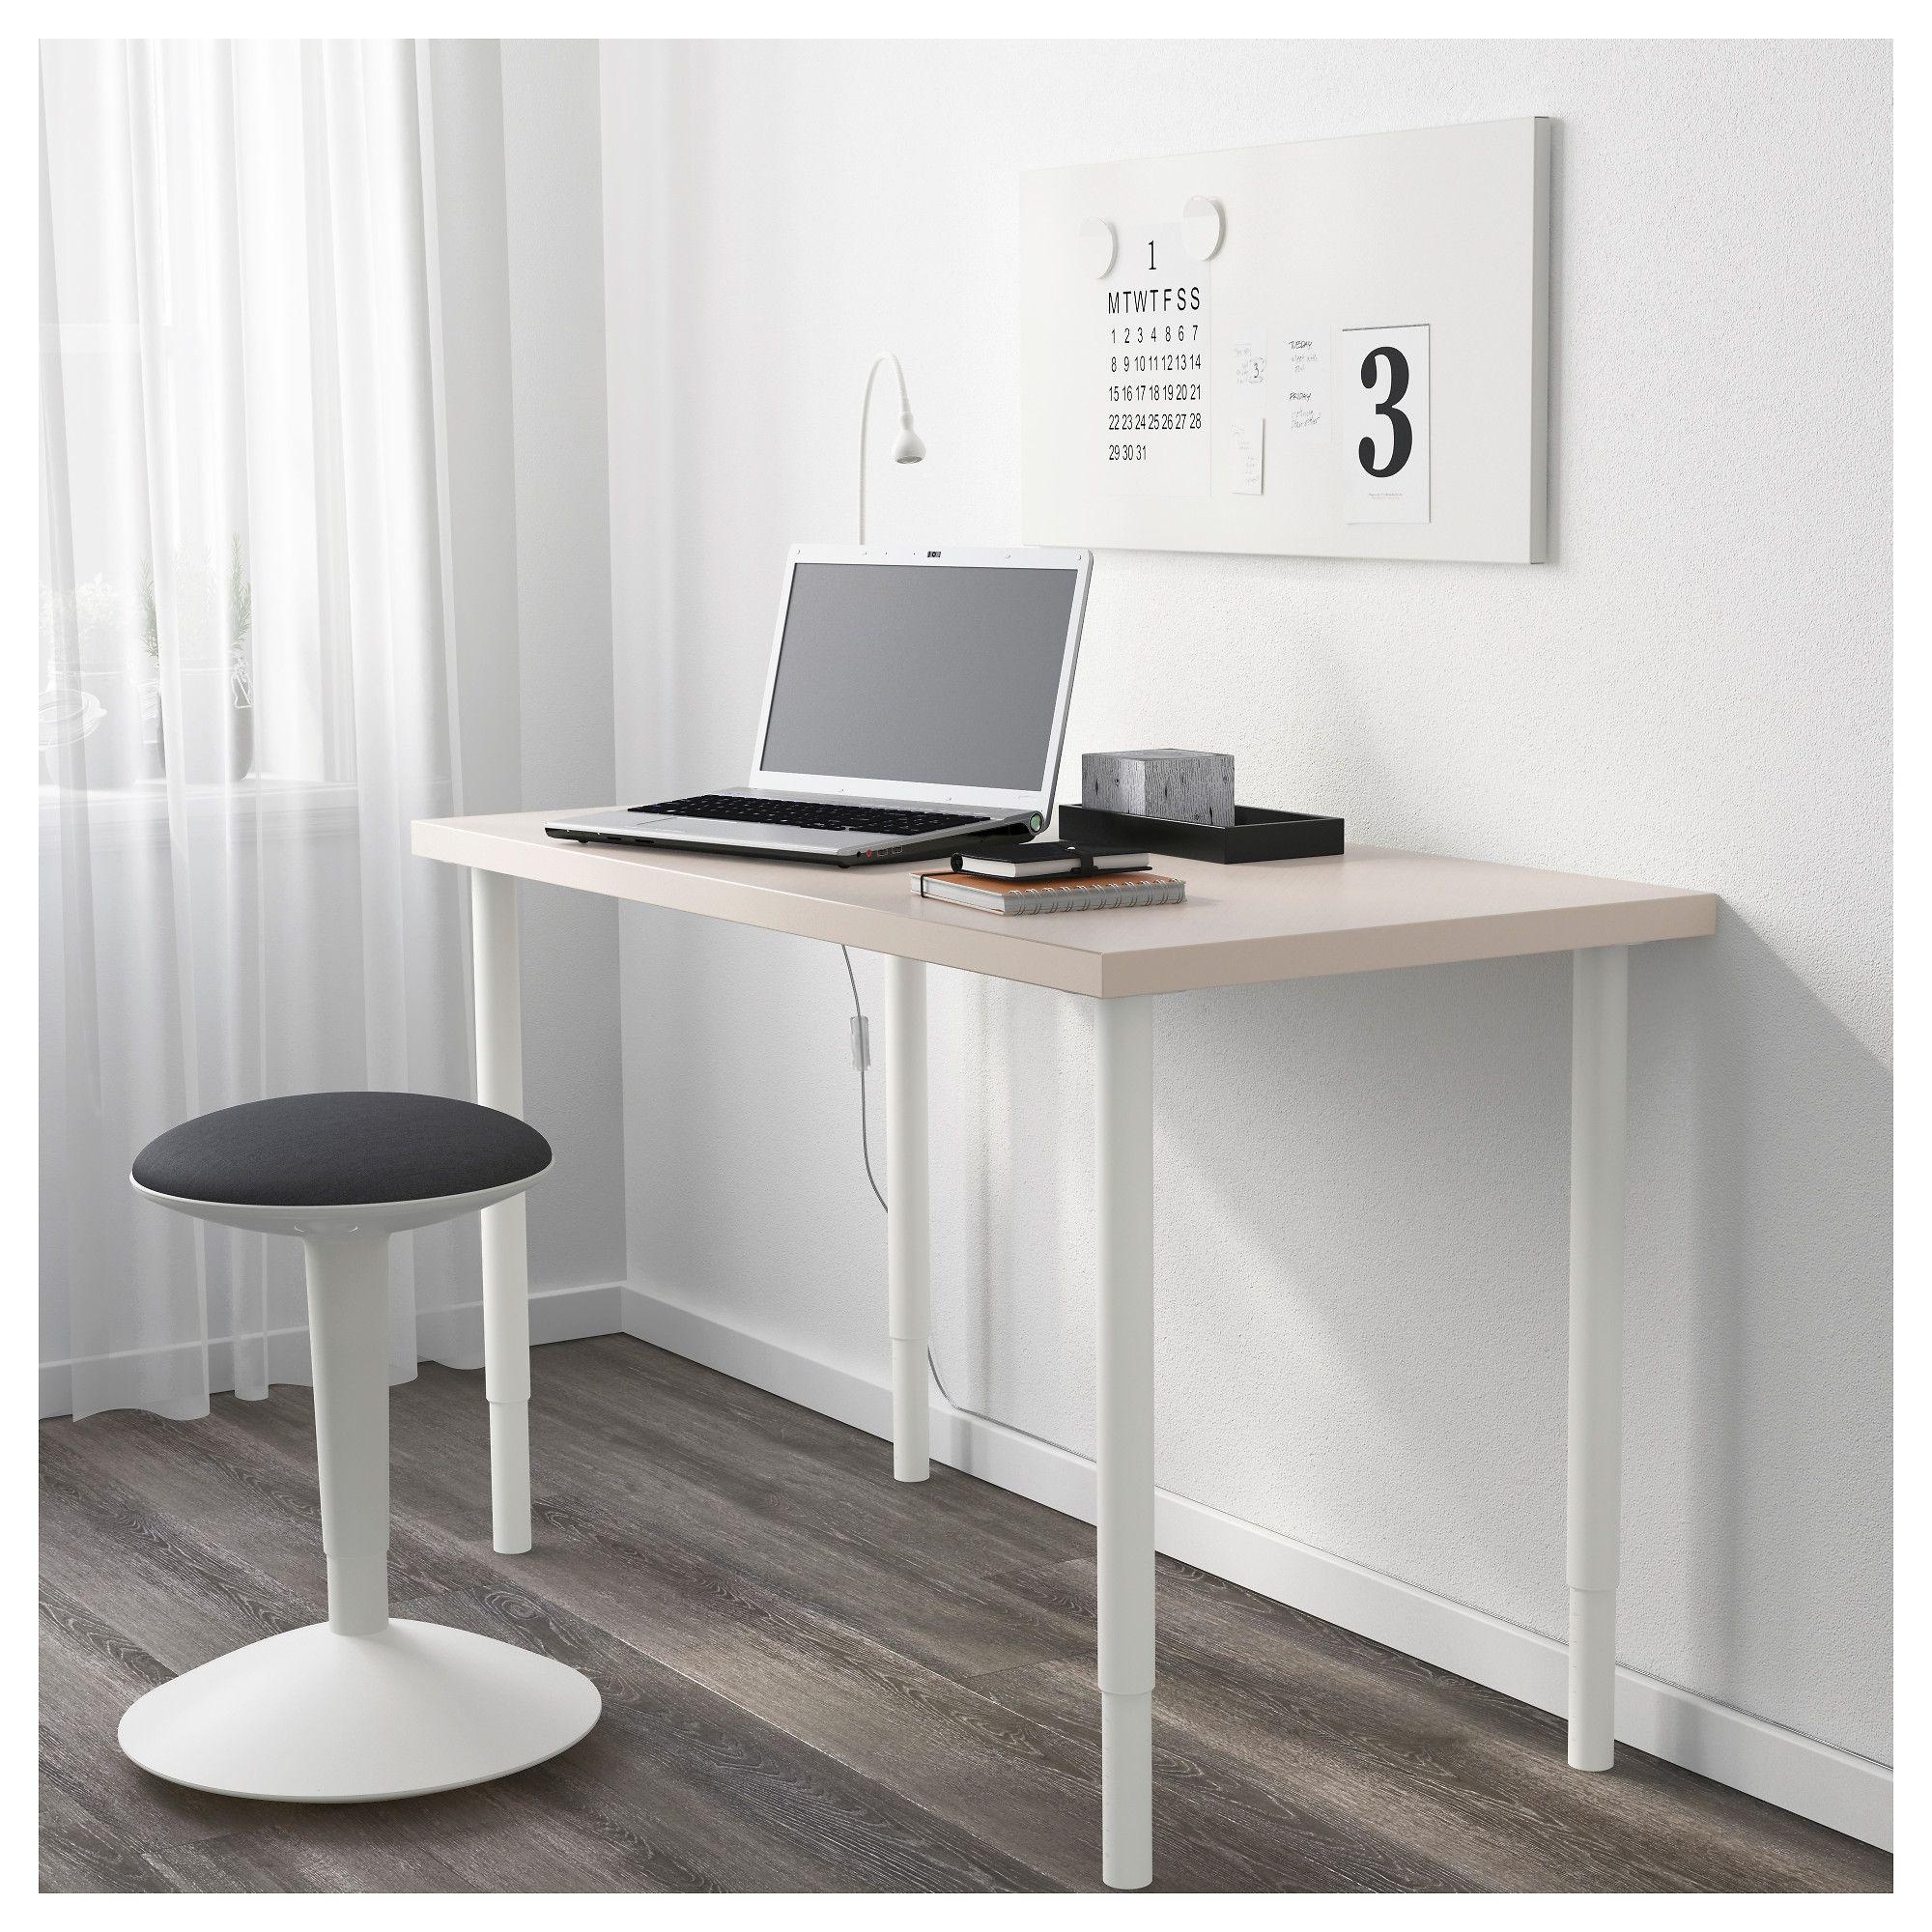 Linnmon Olov Table Geometric Beige White Beige And Products # Ikea Uppleva Pied